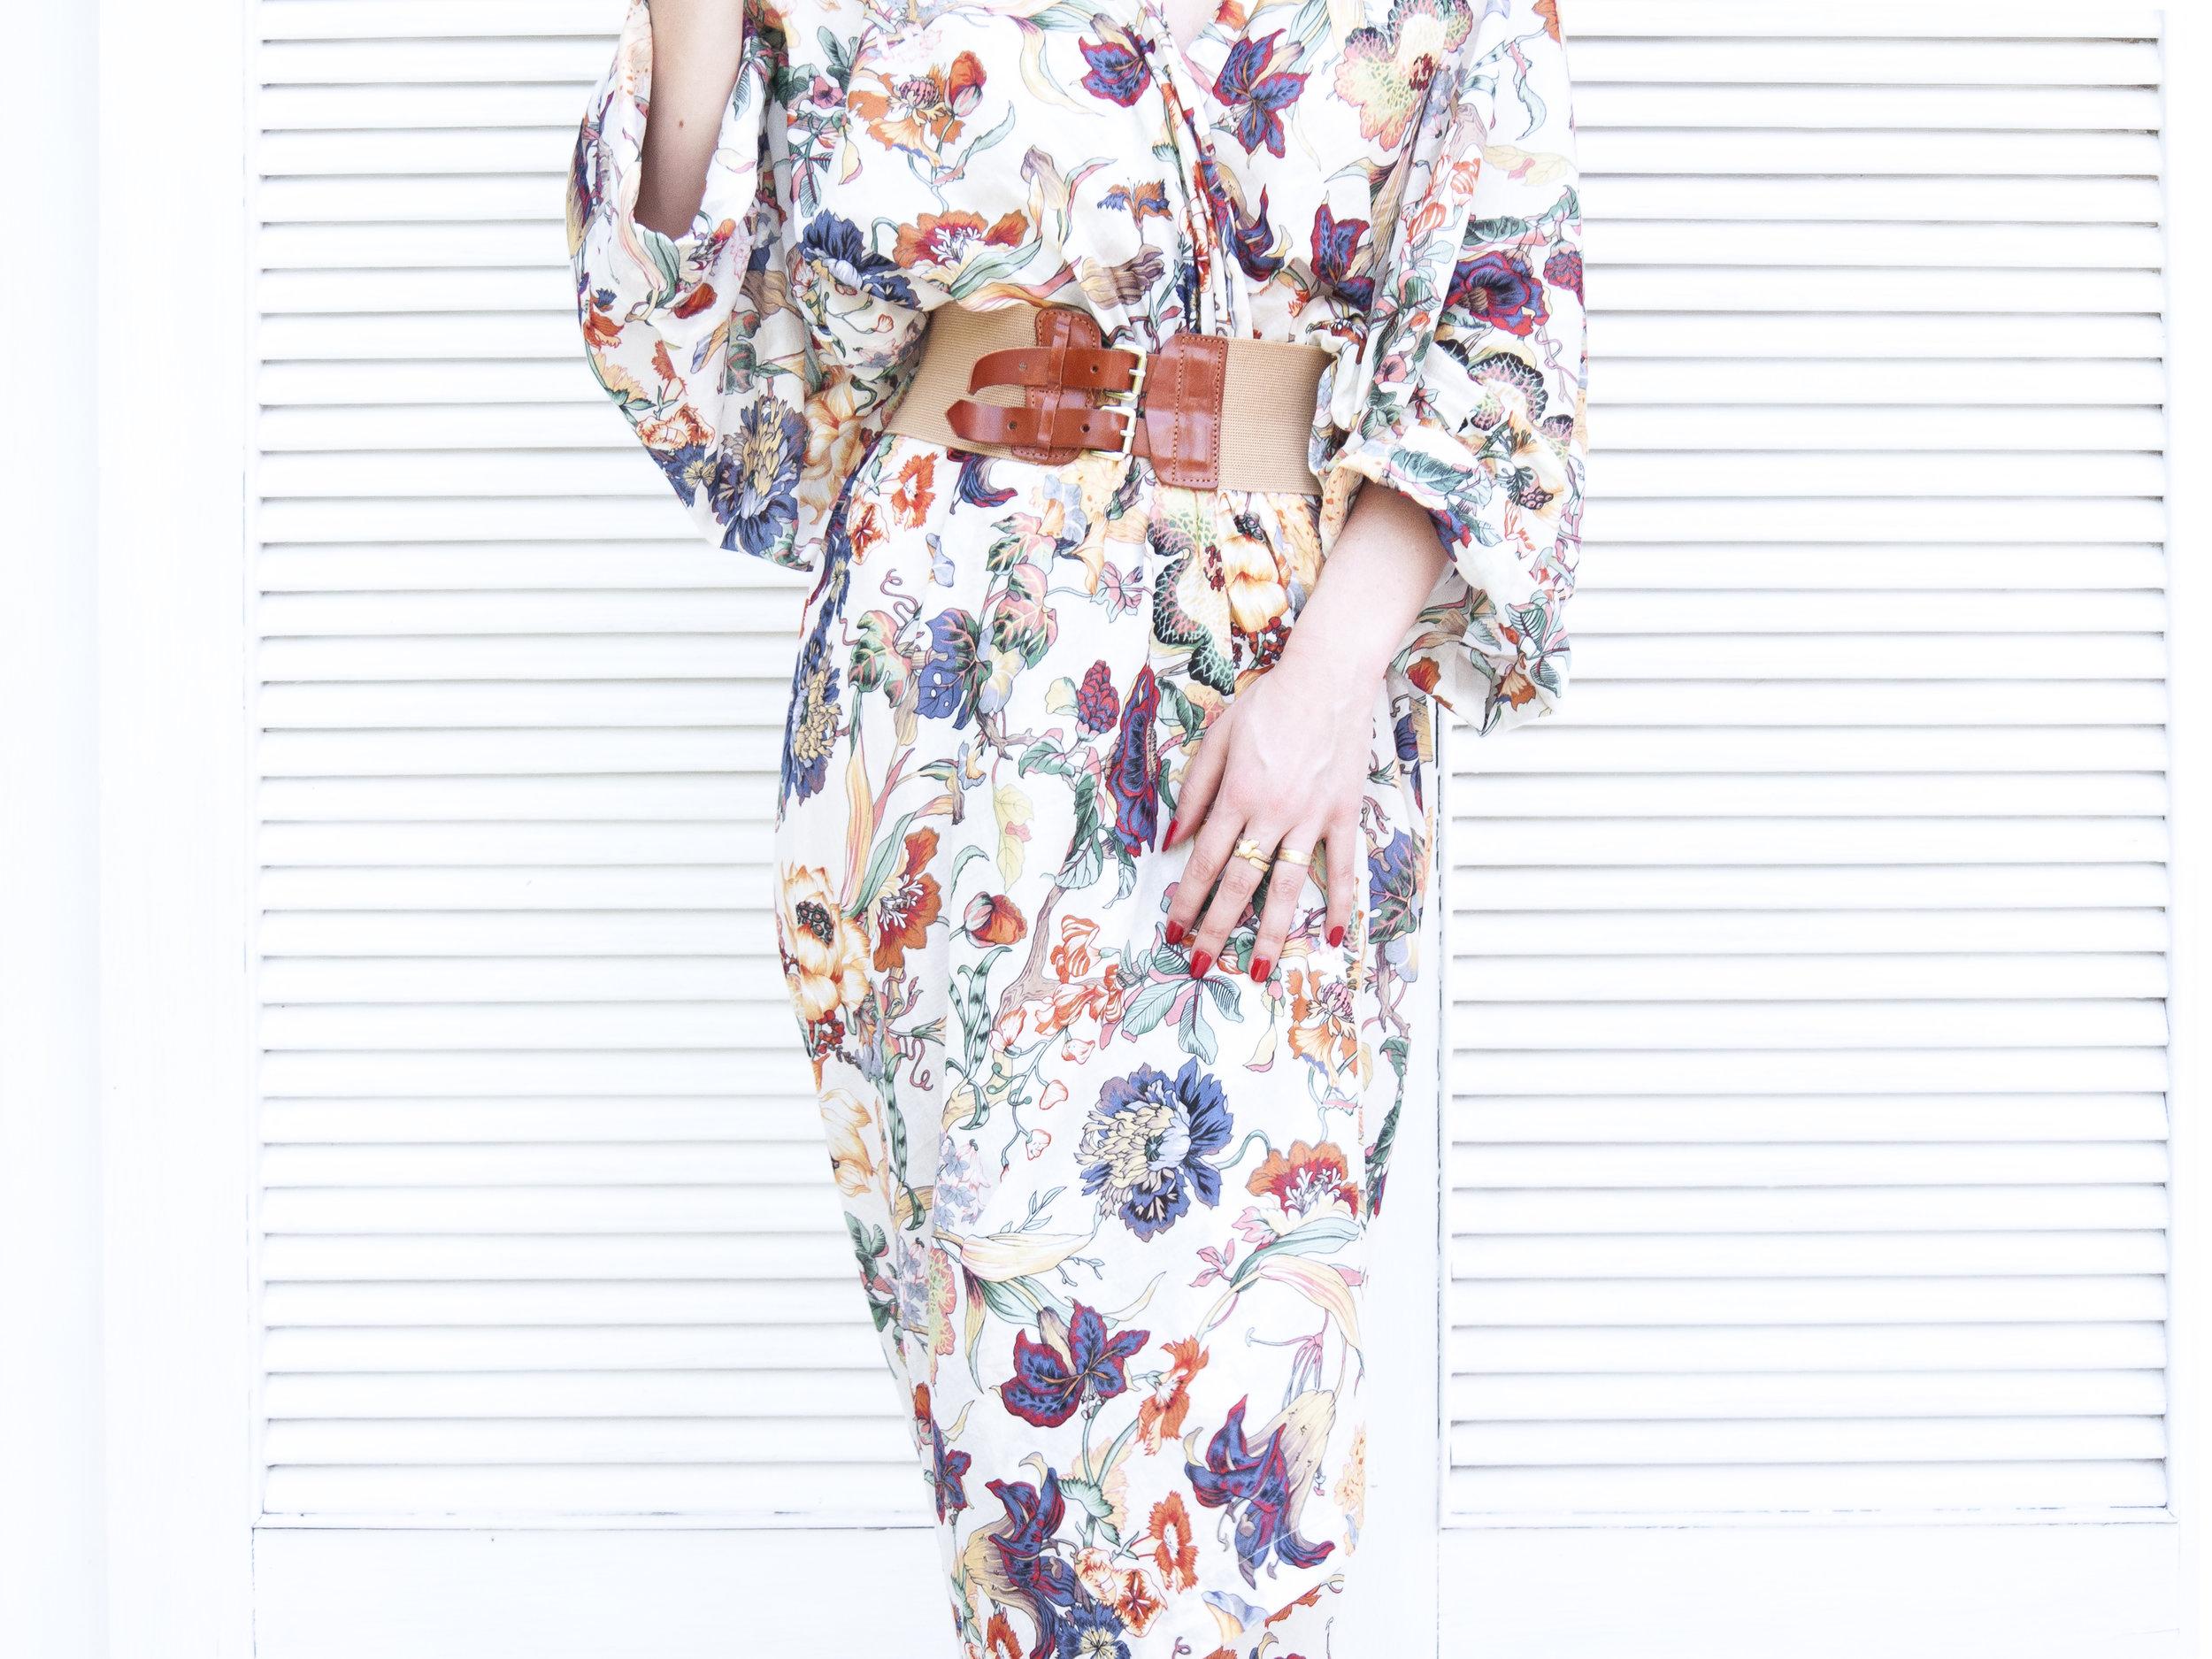 Kelly Thompson Illustration fashion blog Melbourne - Miss Crabb